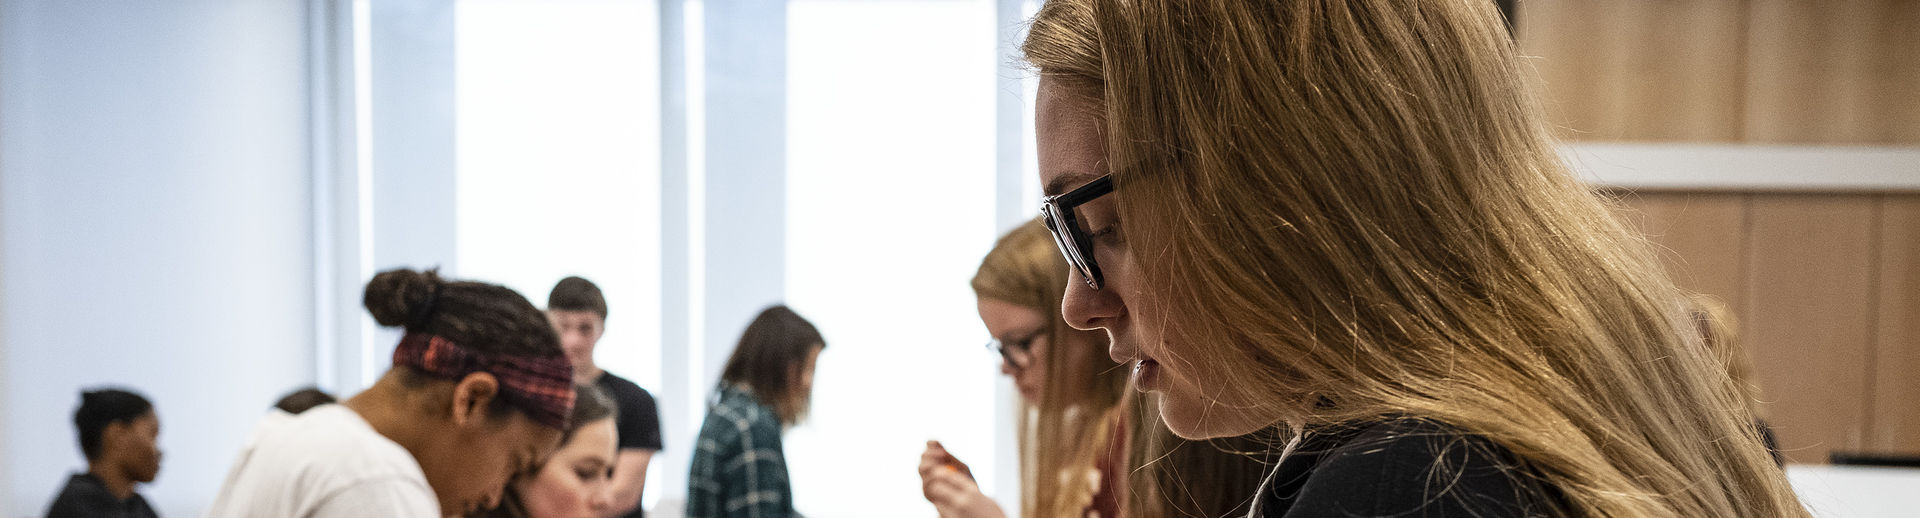 Students in IDEAS Hub